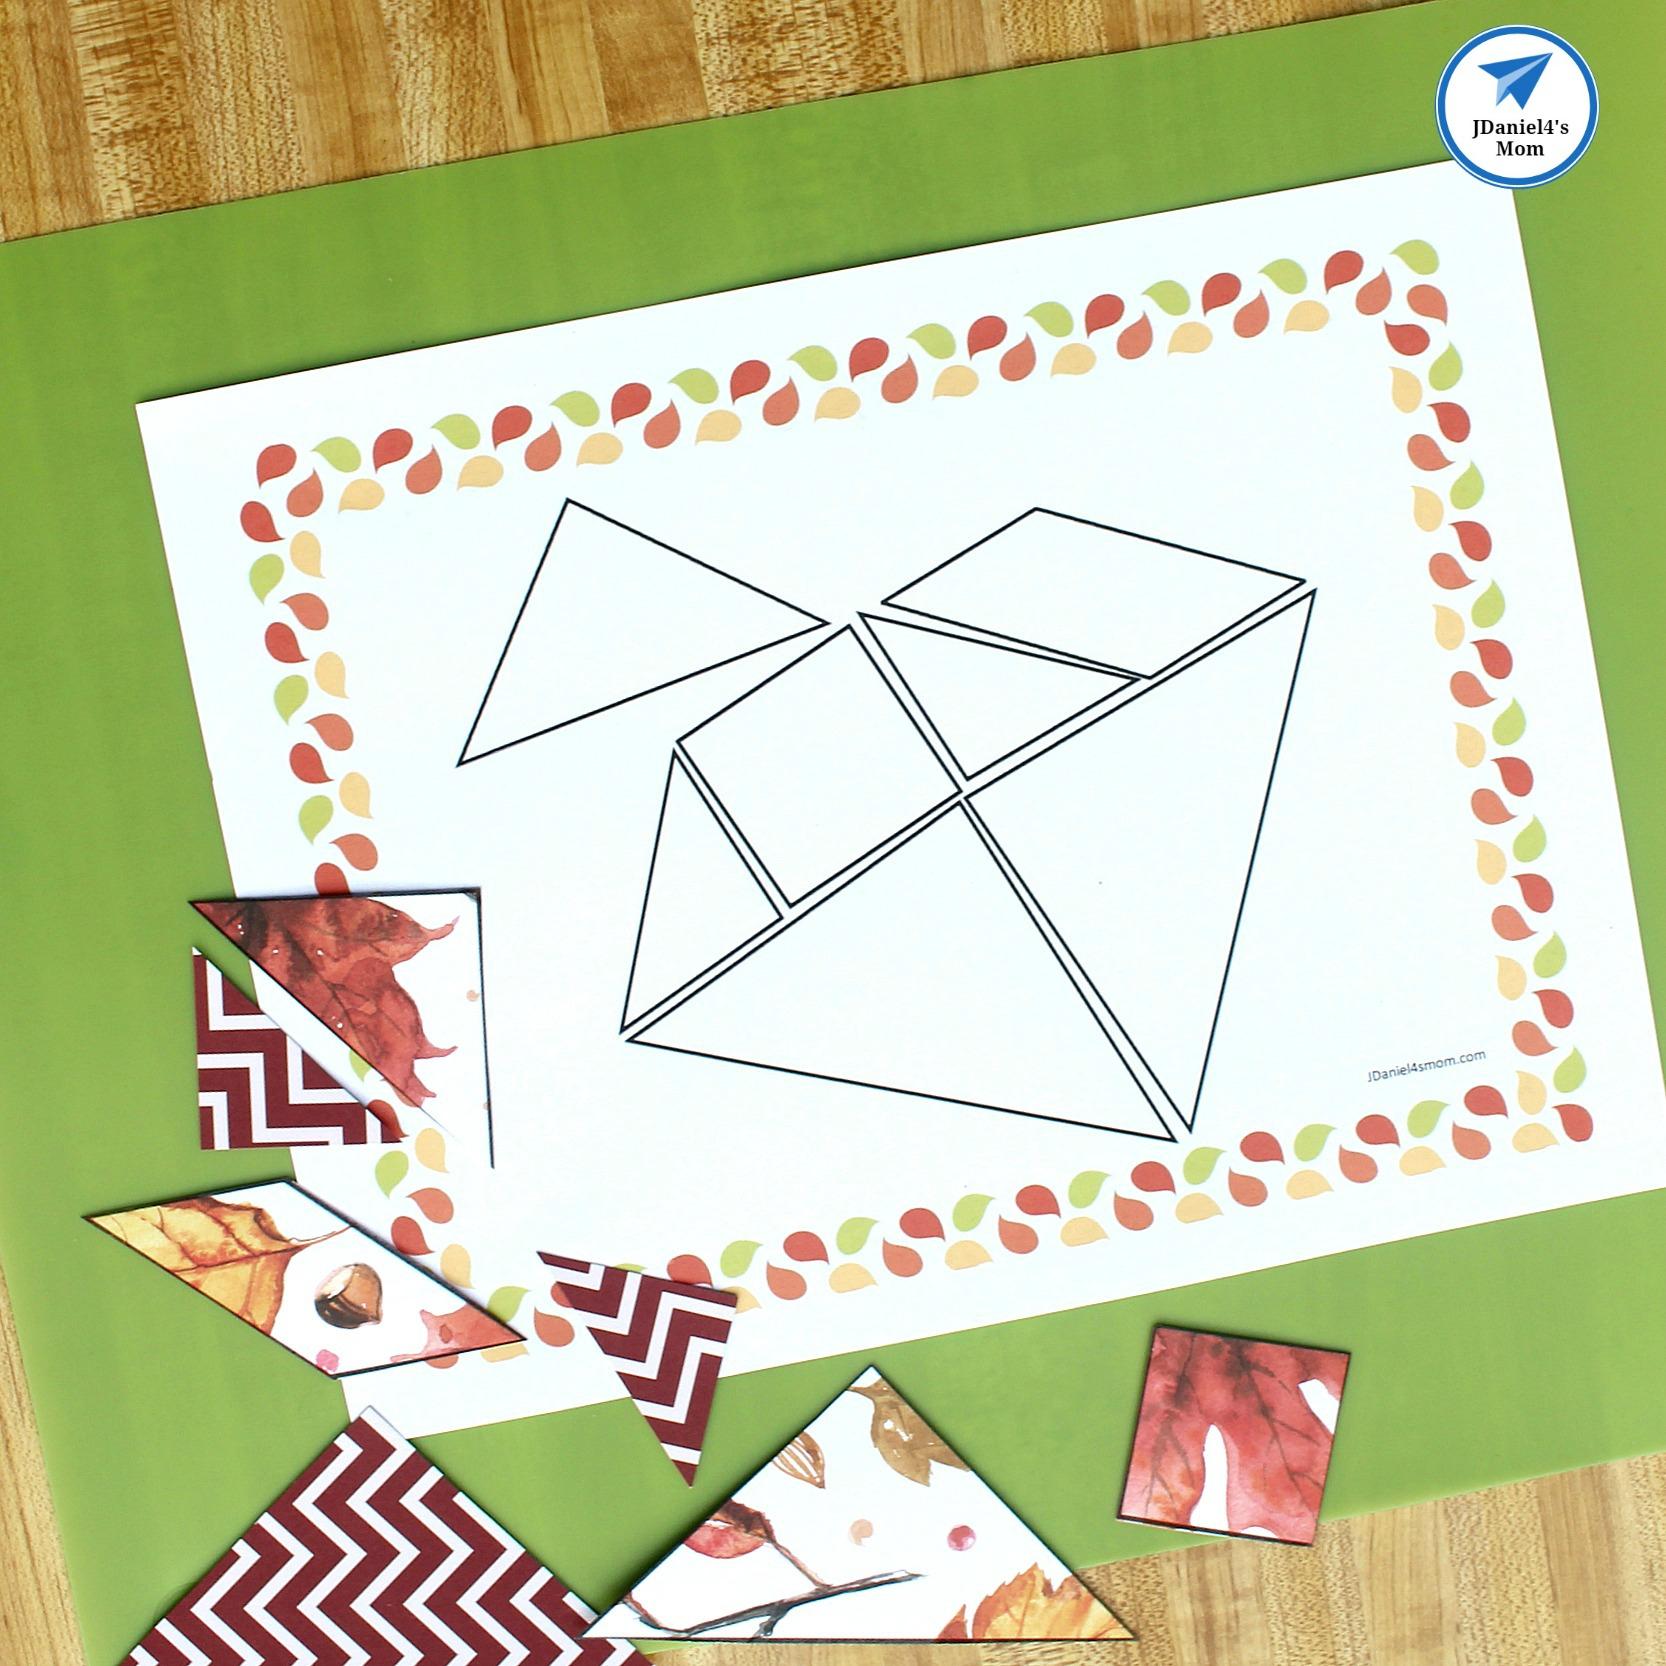 Fall-Themed Printable Tangram Puzzles - Jdaniel4S Mom - Printable Tangram Puzzles